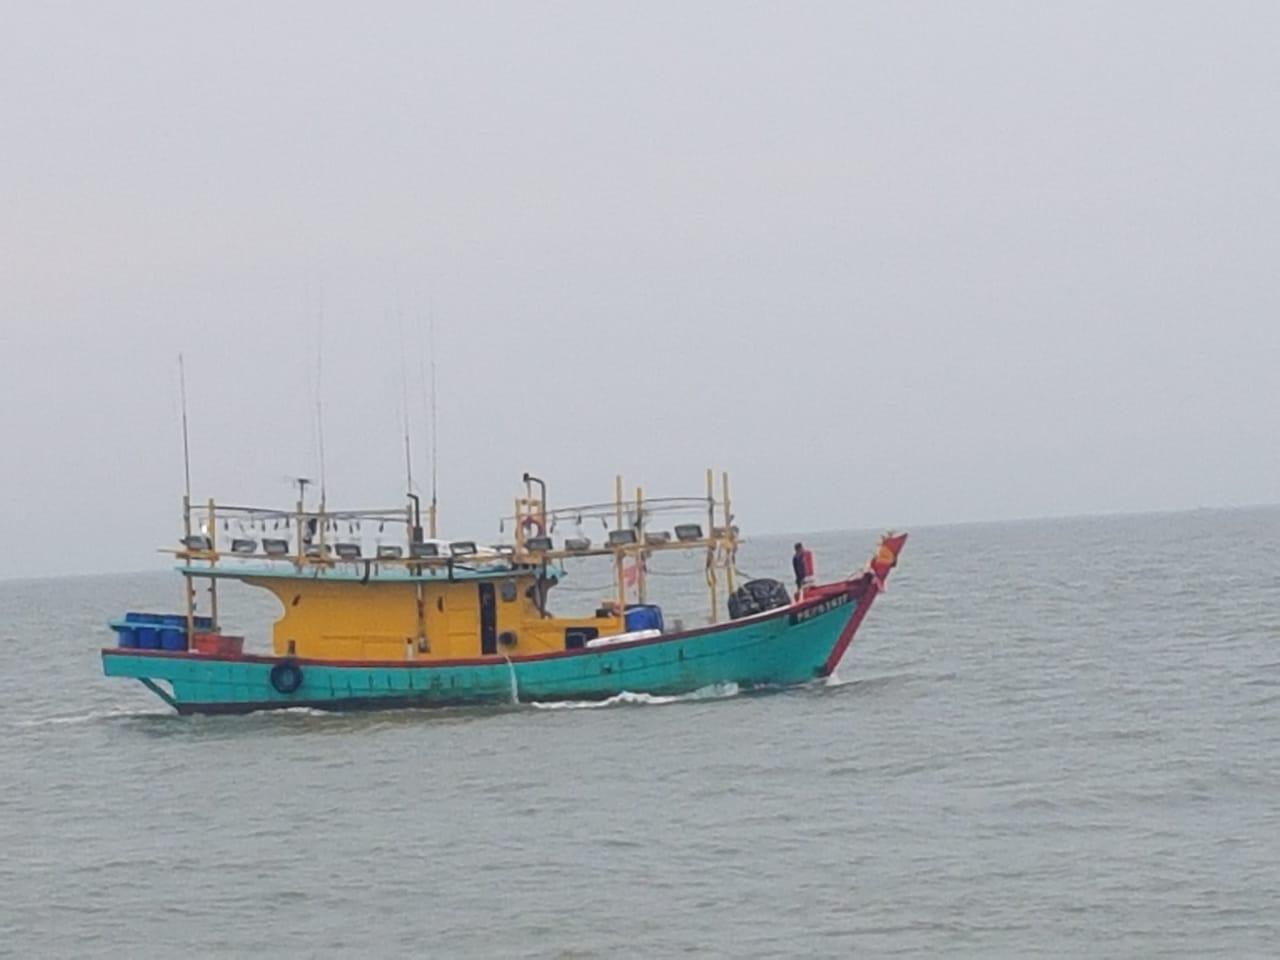 https: img-k.okeinfo.net content 2019 07 23 320 2082546 kkp-tangkap-kapal-ilegal-malaysia-di-selat-malaka-OjWsEqHmtm.jpeg